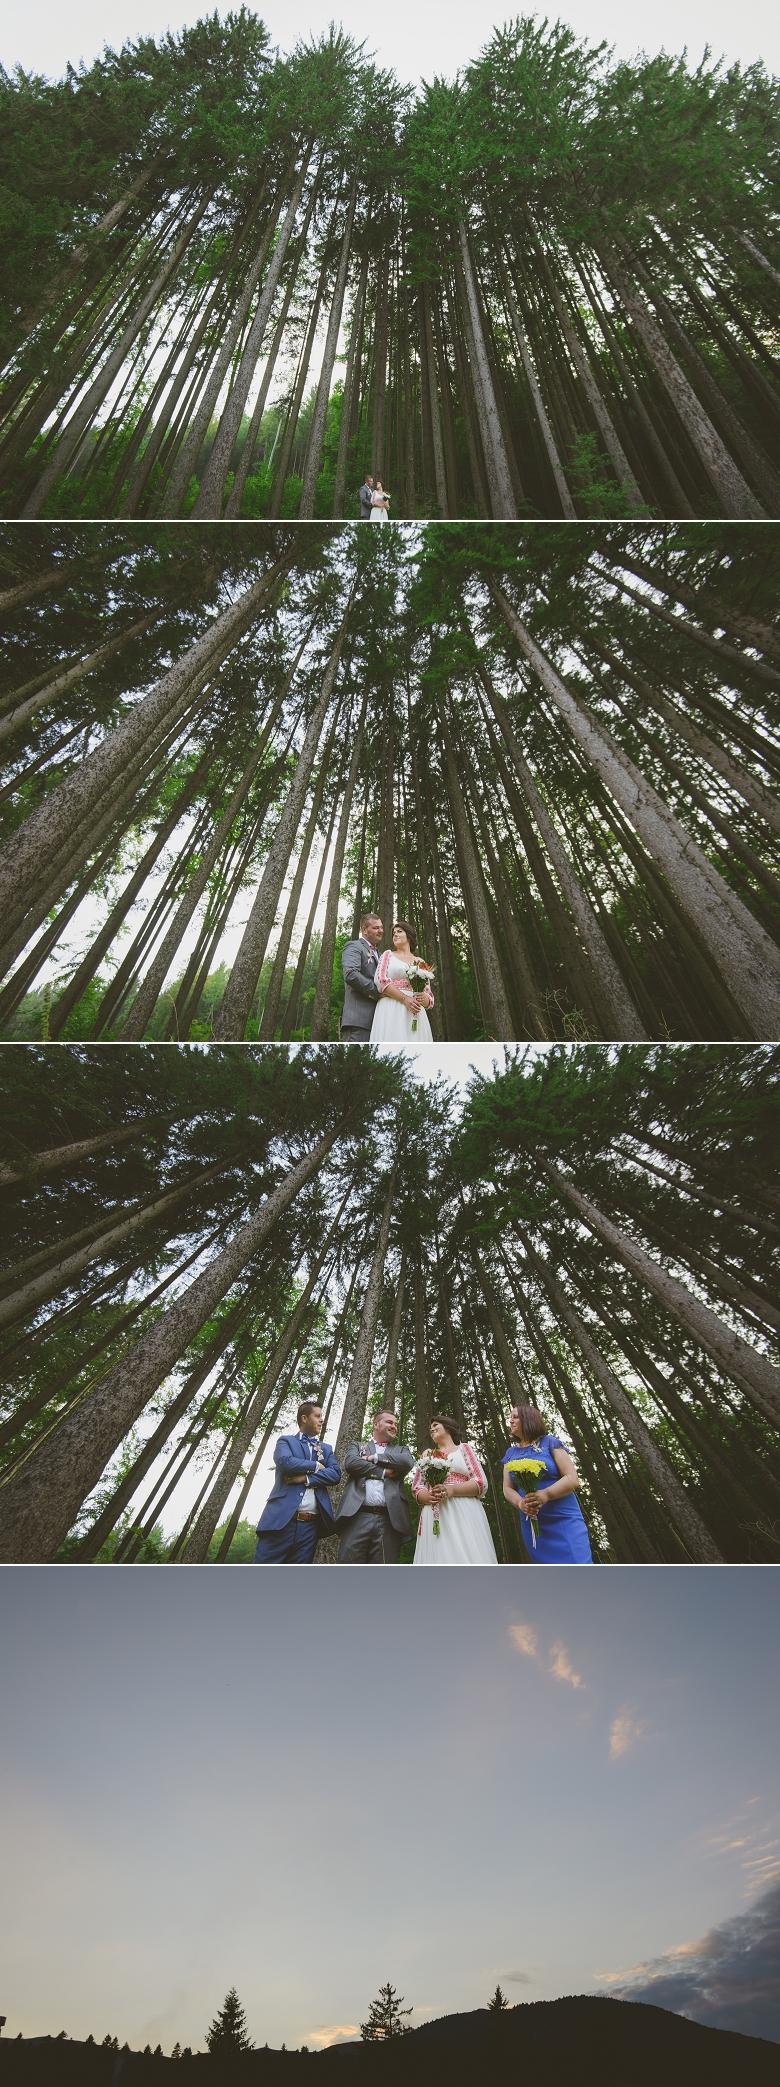 poze__fotograf_nunta_cheia_nunta_maneciu_nunta_valenii_de_munte 13